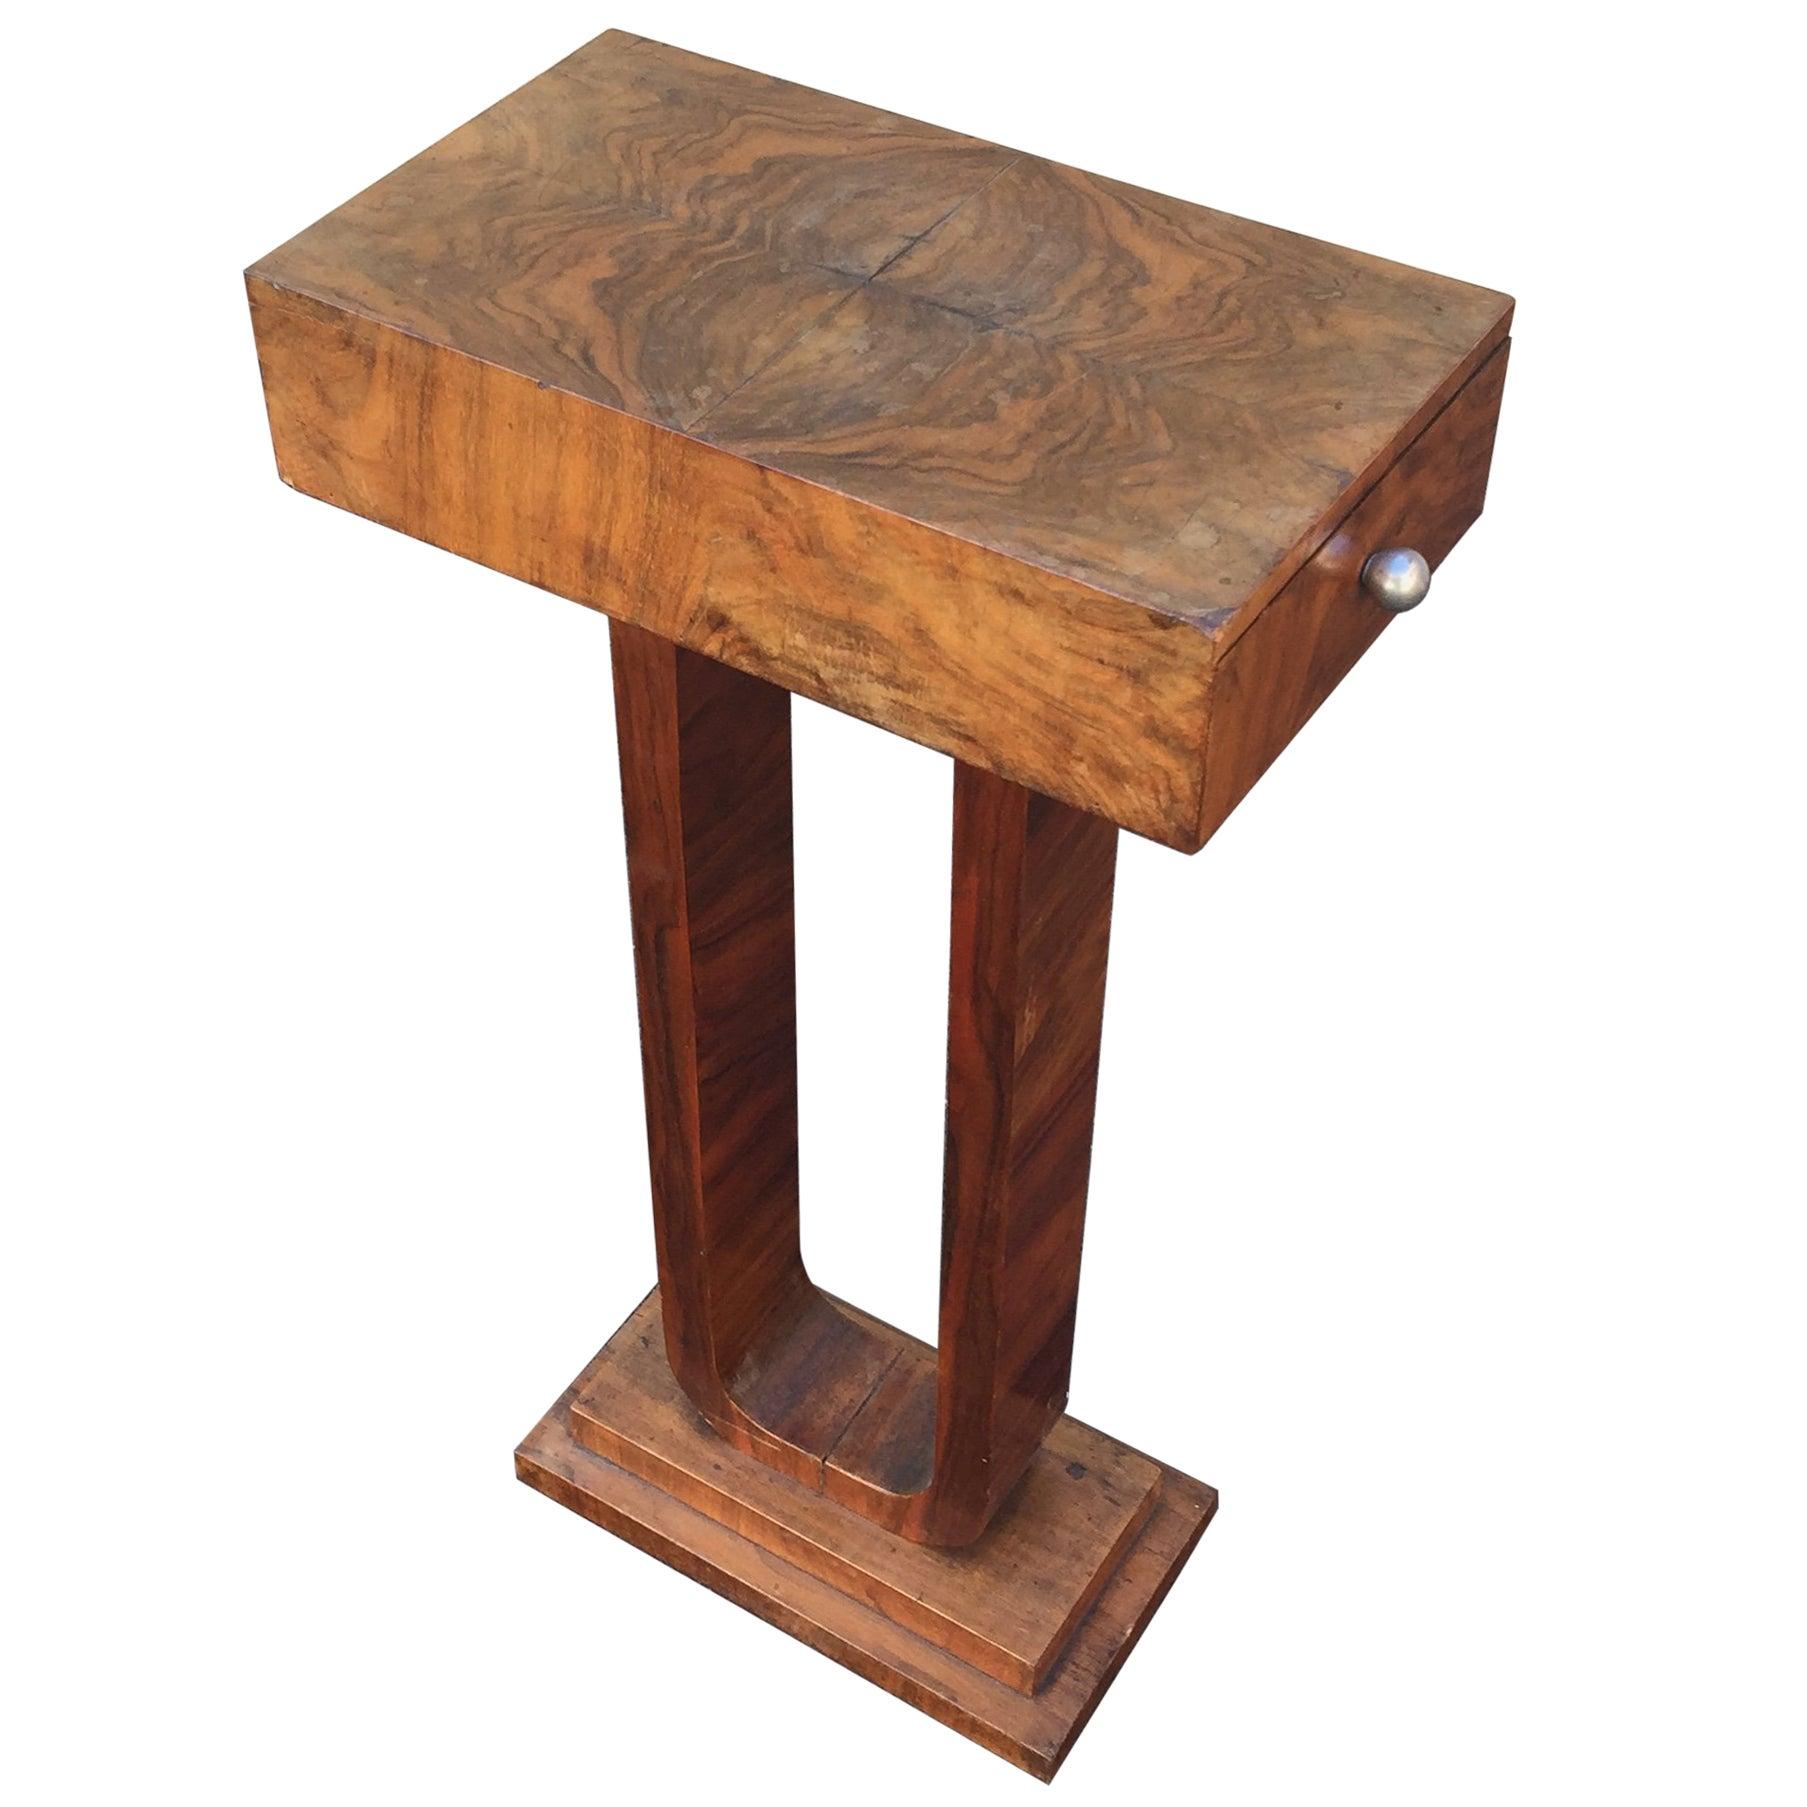 Original Art Deco Side Table in Walnut Veneer, circa 1930